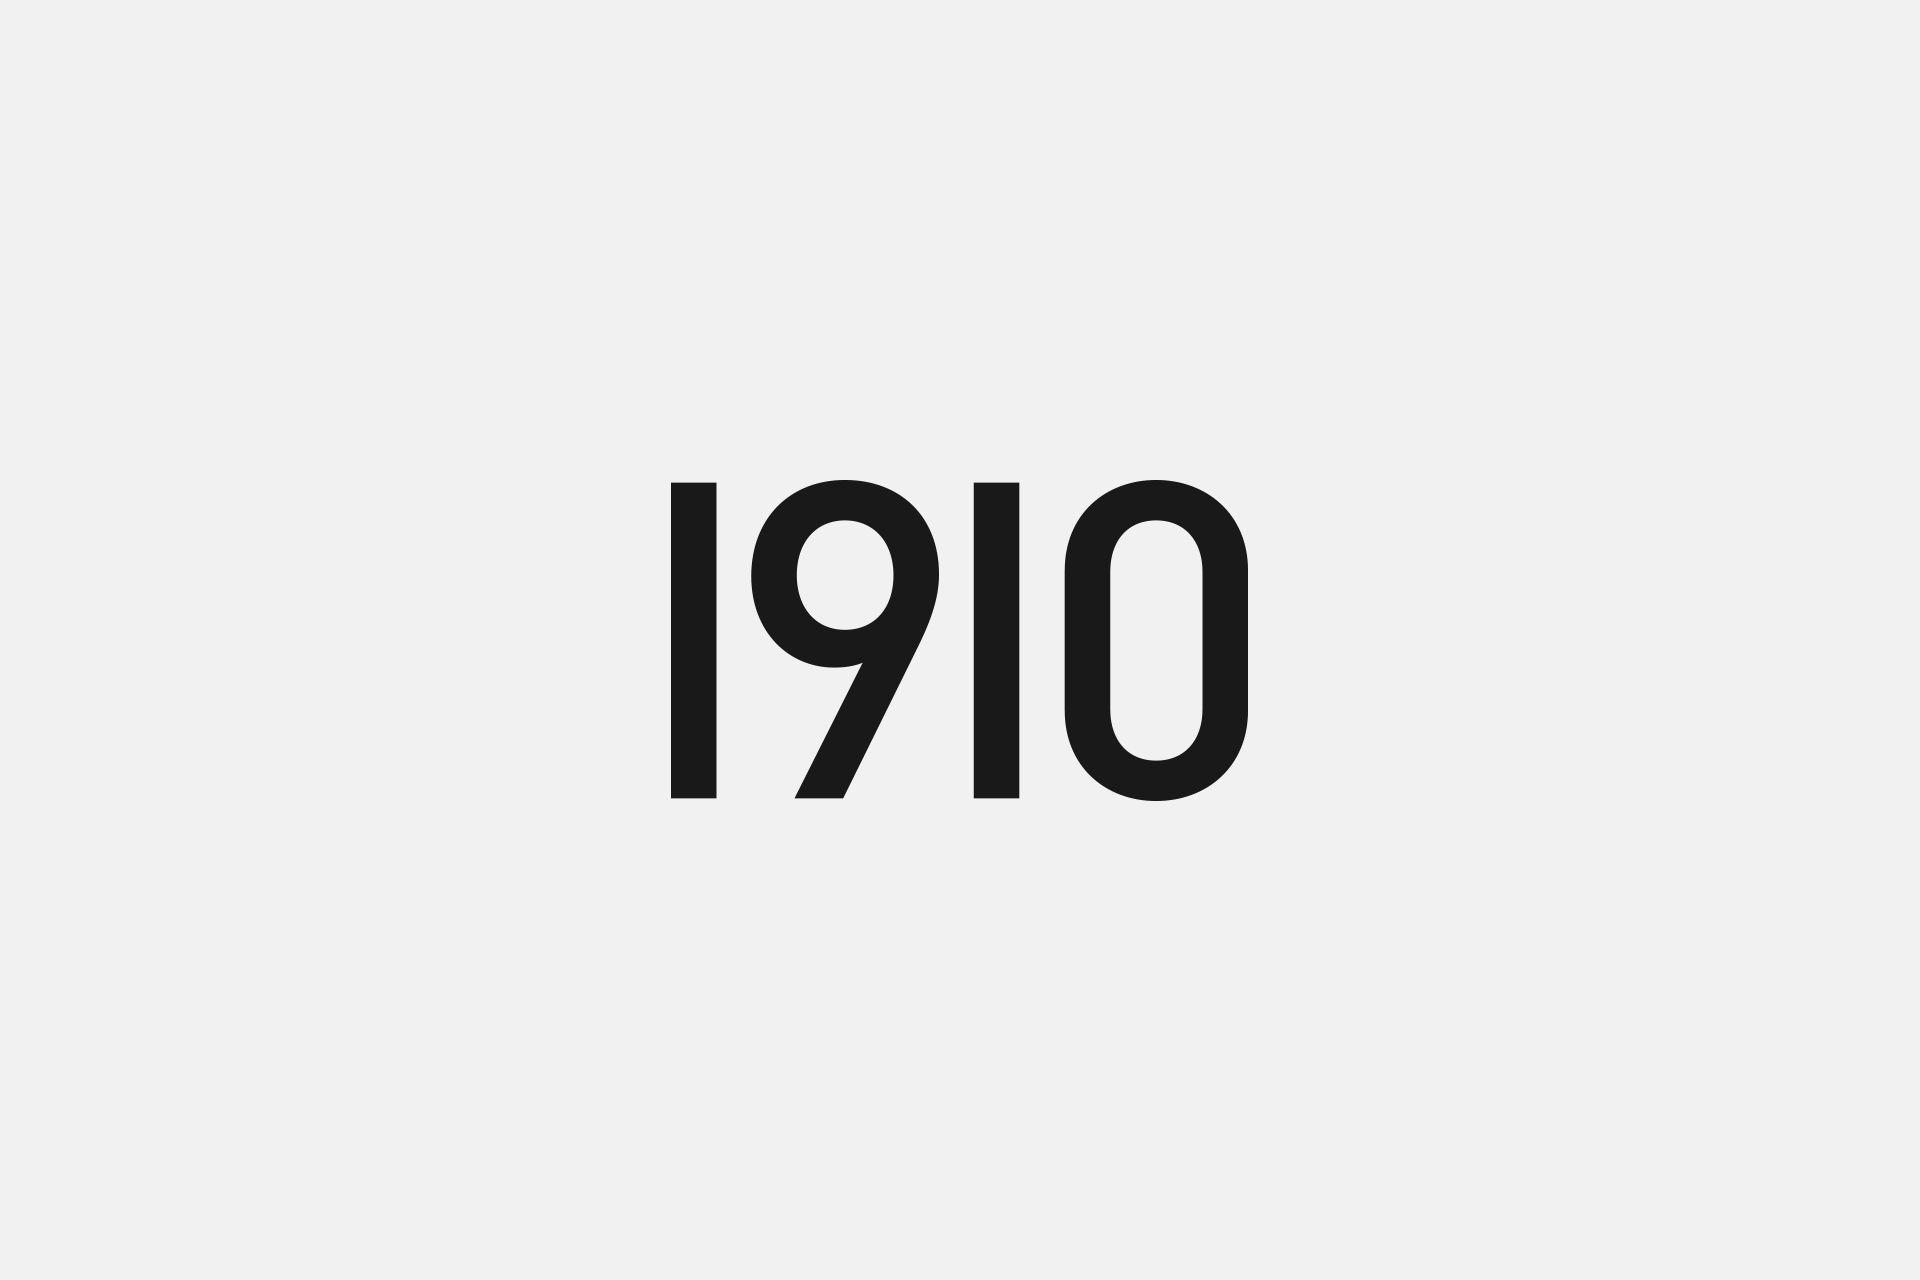 Logos & Marks | 1910 Design & Communication